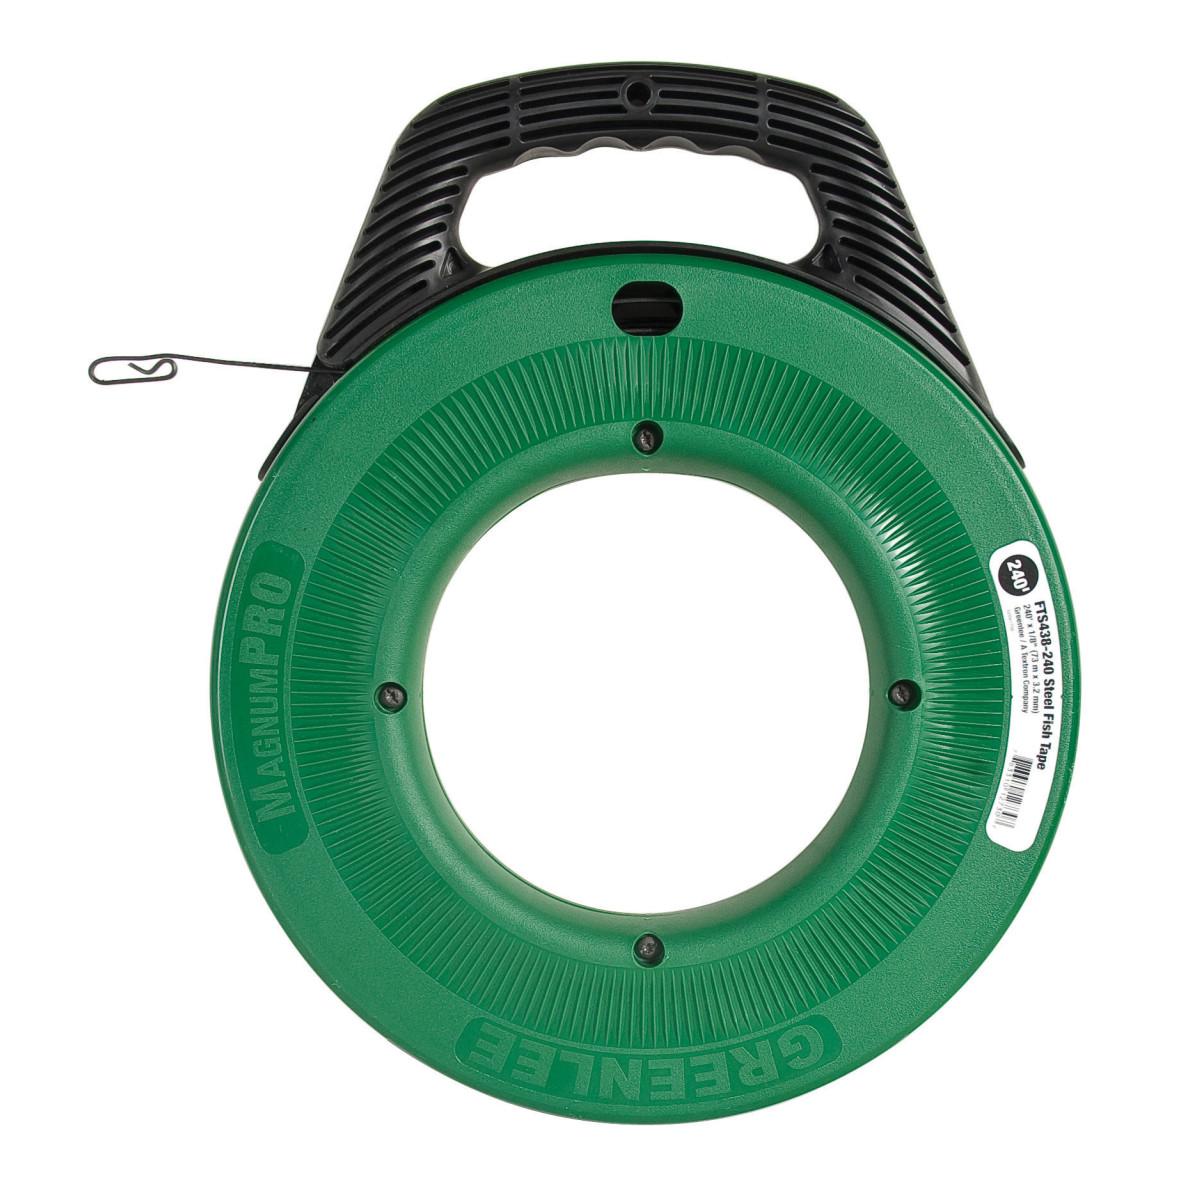 "Greenlee FTS438-240BP Spring Steel Fish Tape - 240' x 1/8"" (Bulk Pack)"